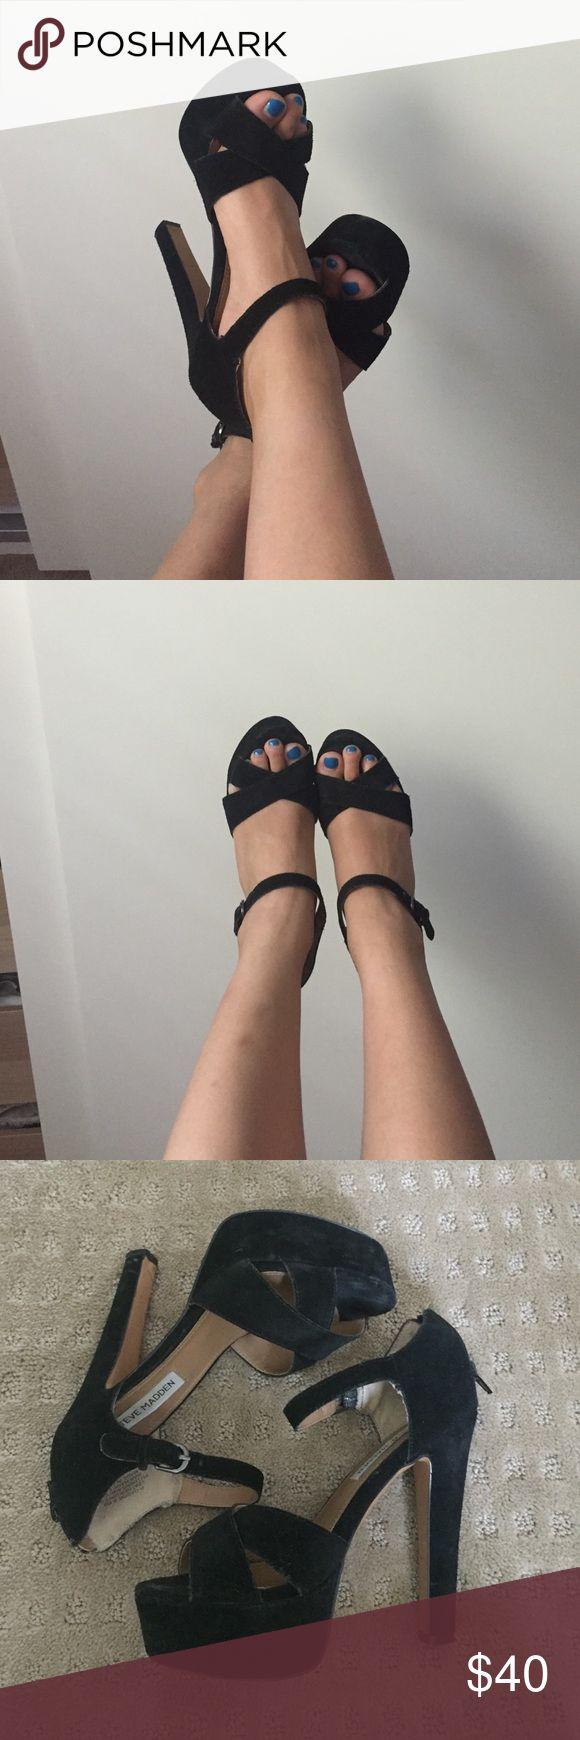 ⚡️SALE⚡️Steve Madden Gabor Heels Super comfy platform heels in black suede. Loved and in preowned condition. Steve Madden Shoes Platforms